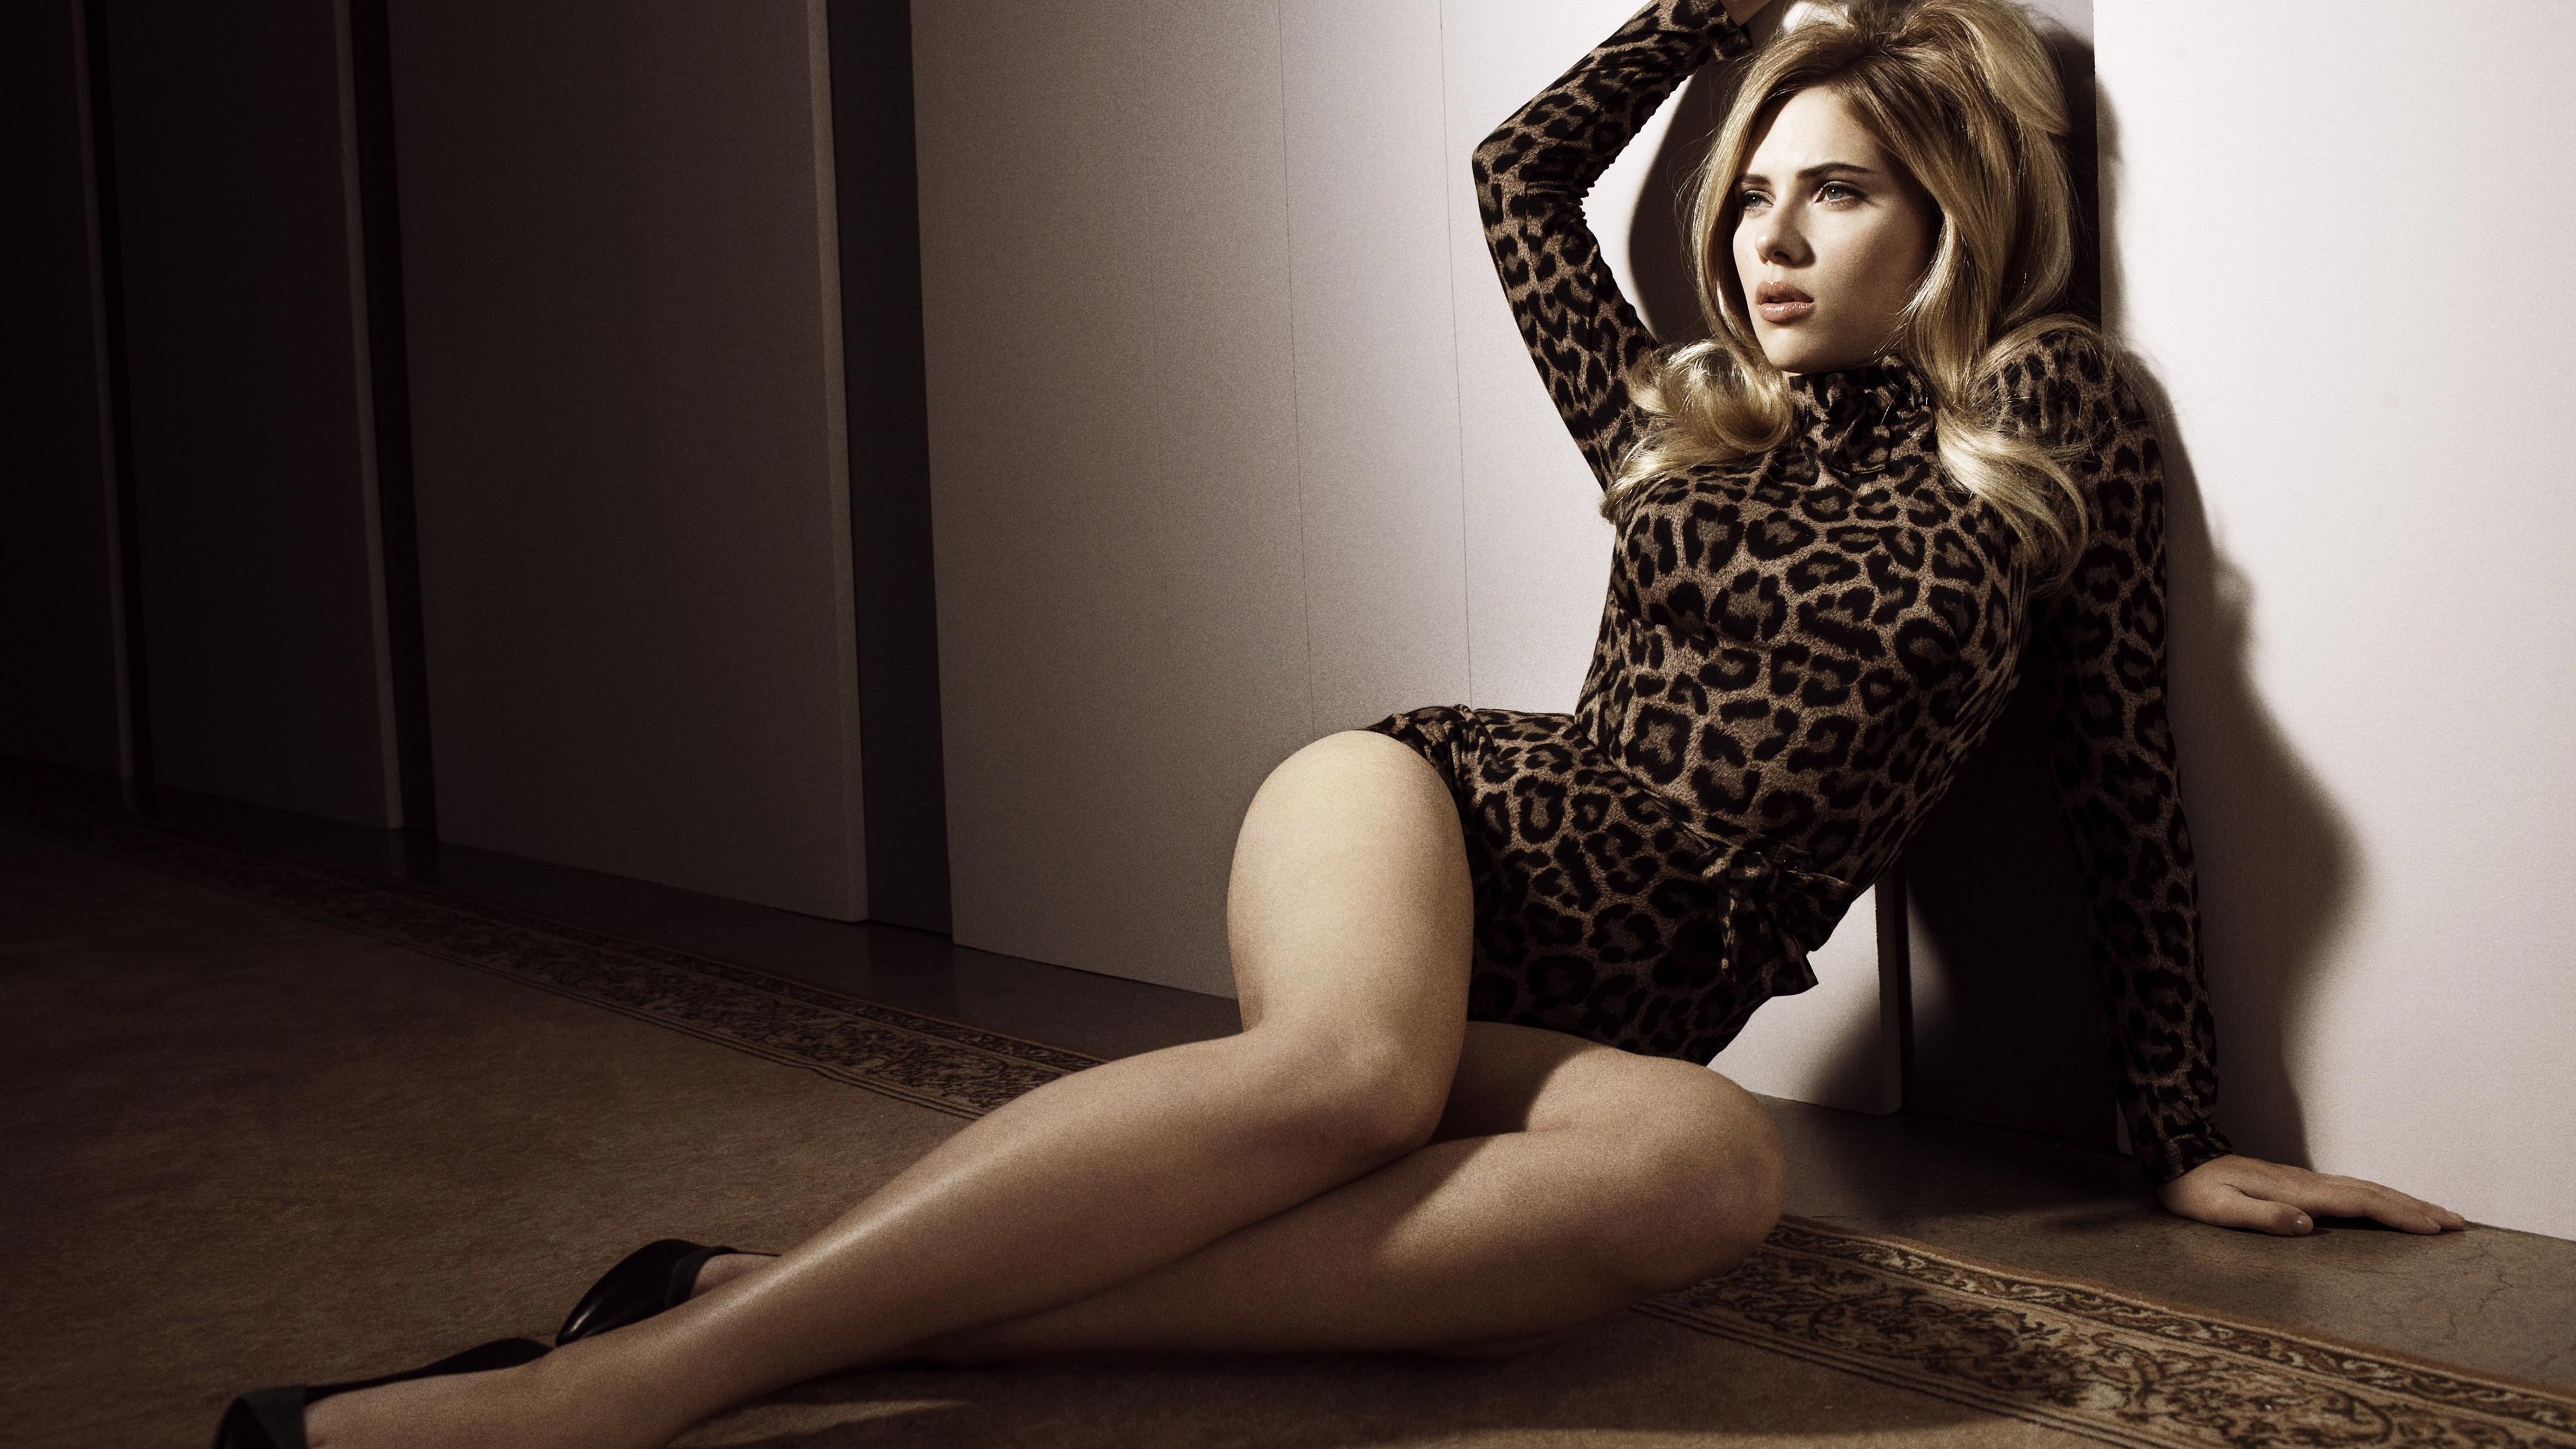 scarlett johansson 2016 1536857390 - Scarlett Johansson 2016 - scarlett johansson wallpapers, girls wallpapers, celebrities wallpapers